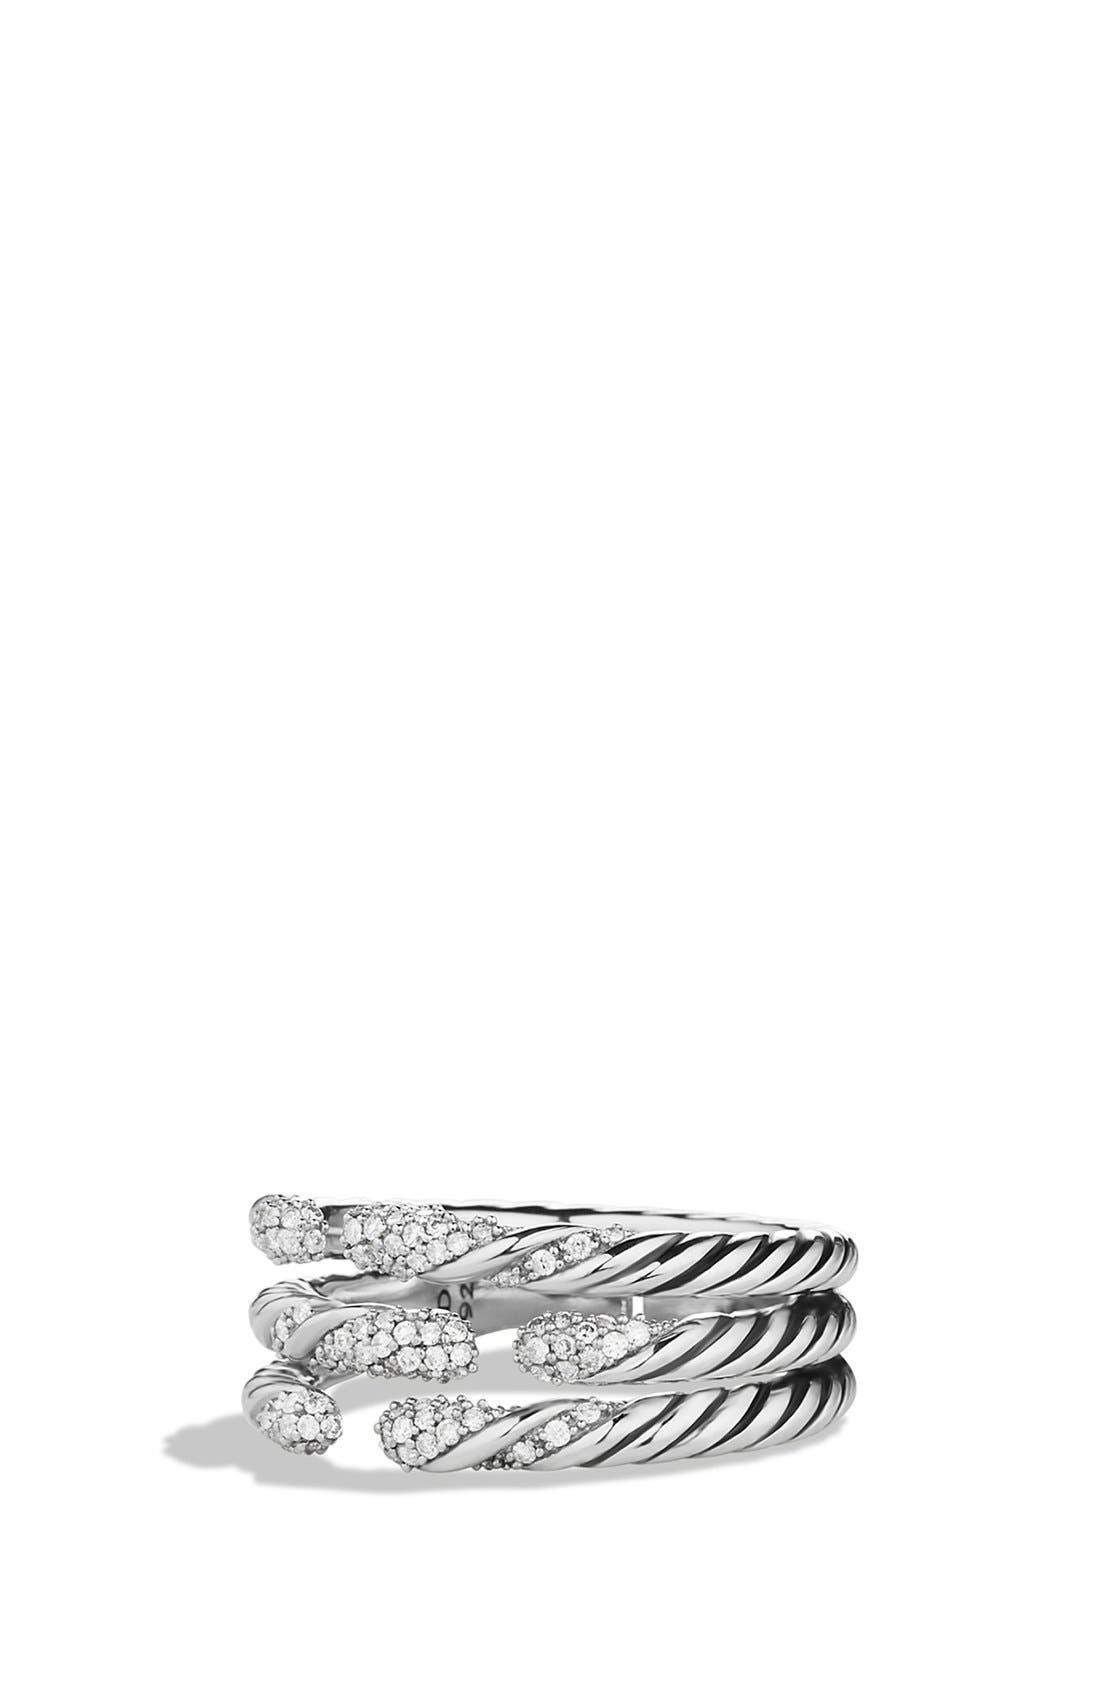 Main Image - David Yurman 'Willow' Three-Row Ring with Diamonds